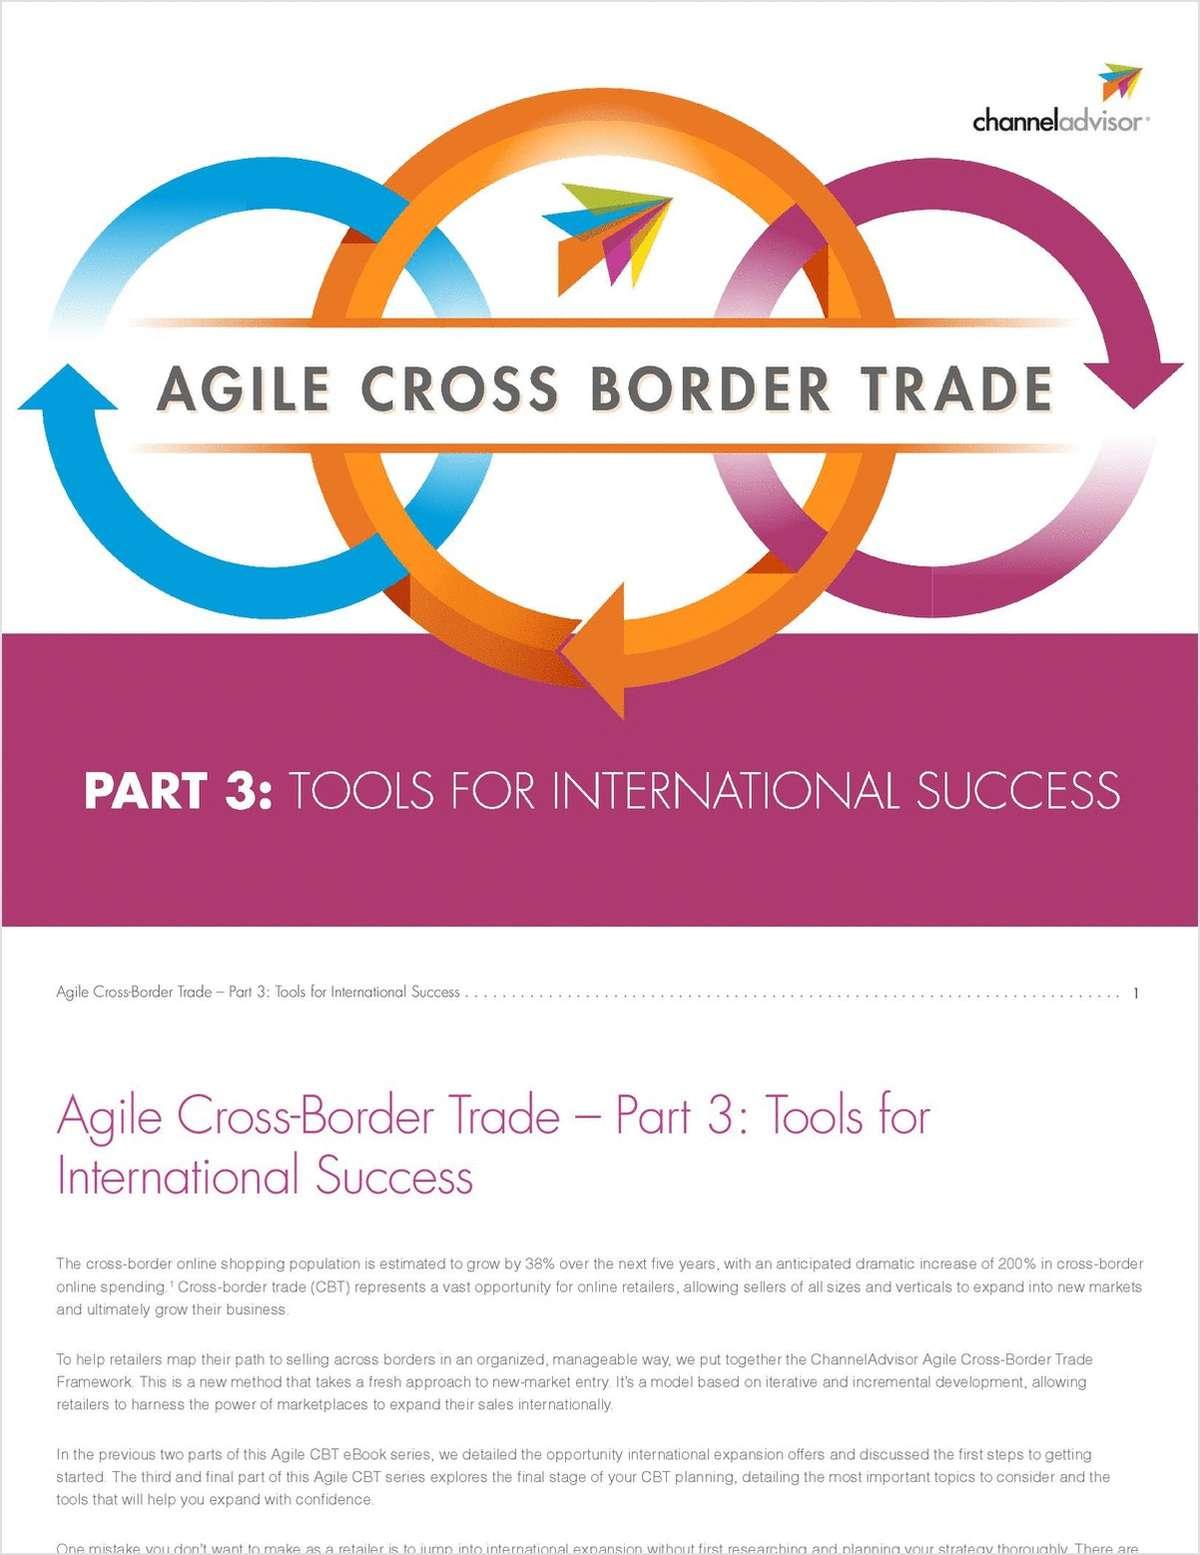 Agile Cross-Border Trade - Part 3: Tools for International Success